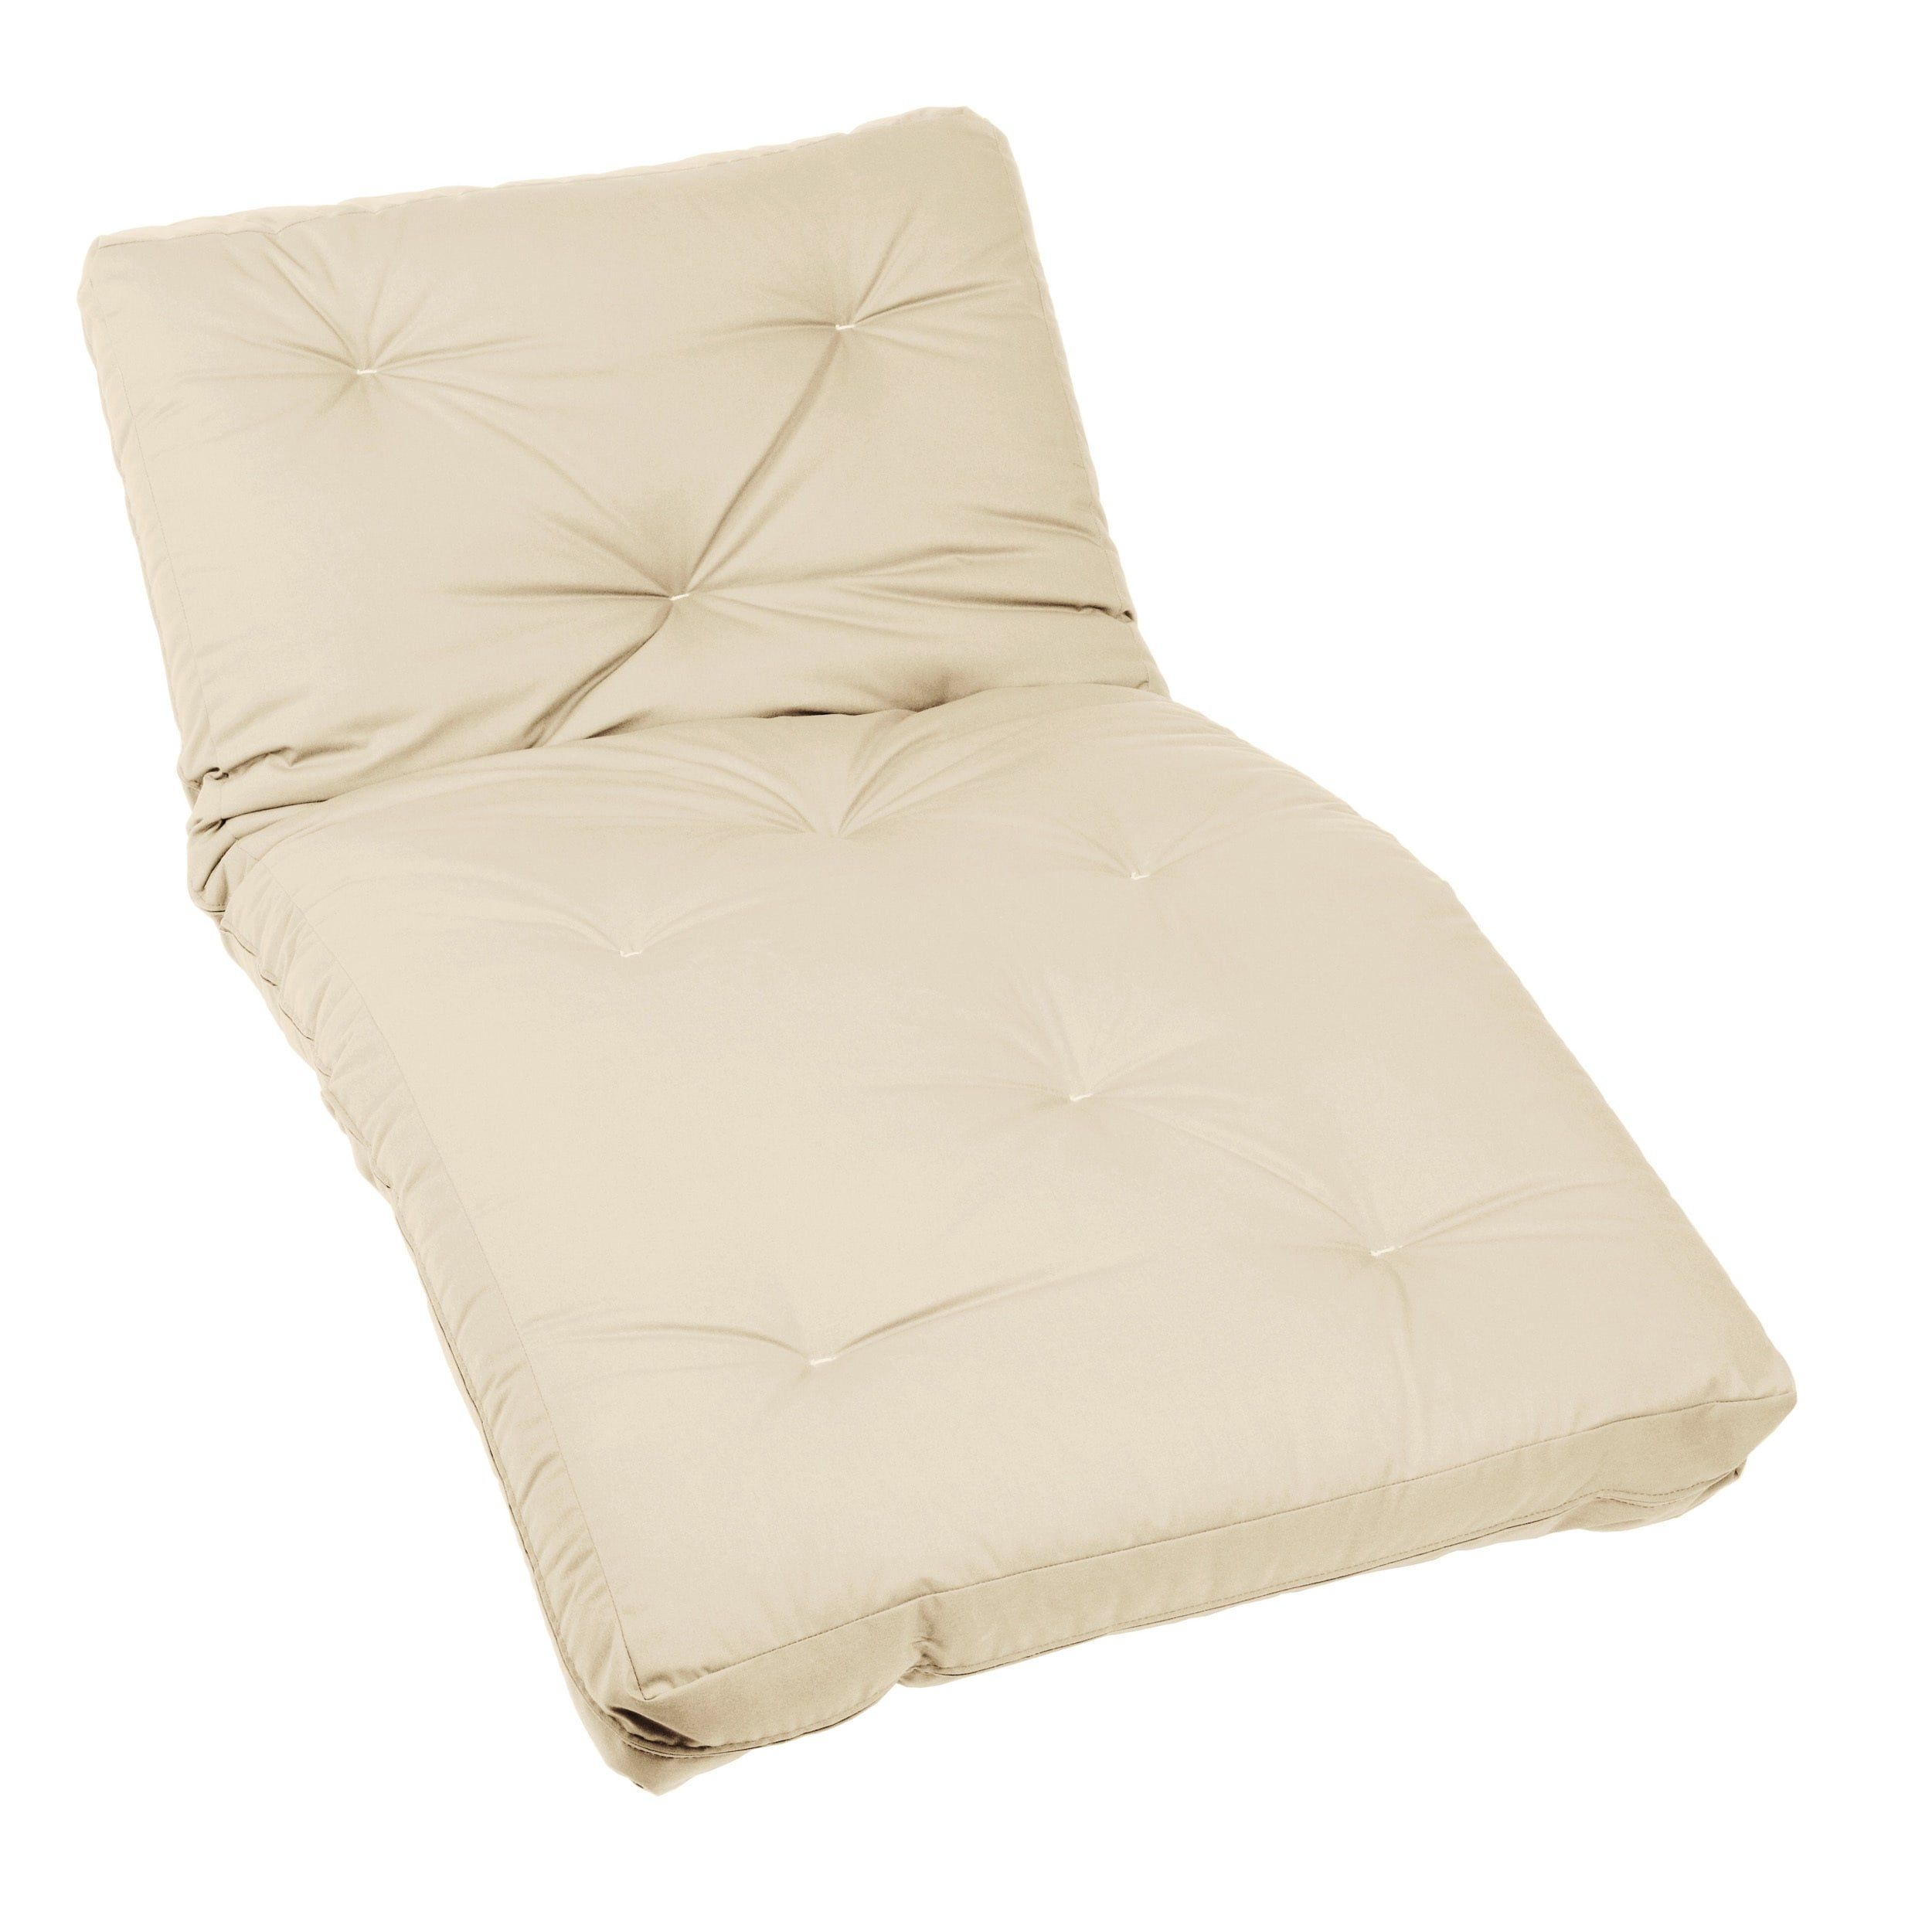 mozaic company twin size ivory futon mattress twin 10 find out